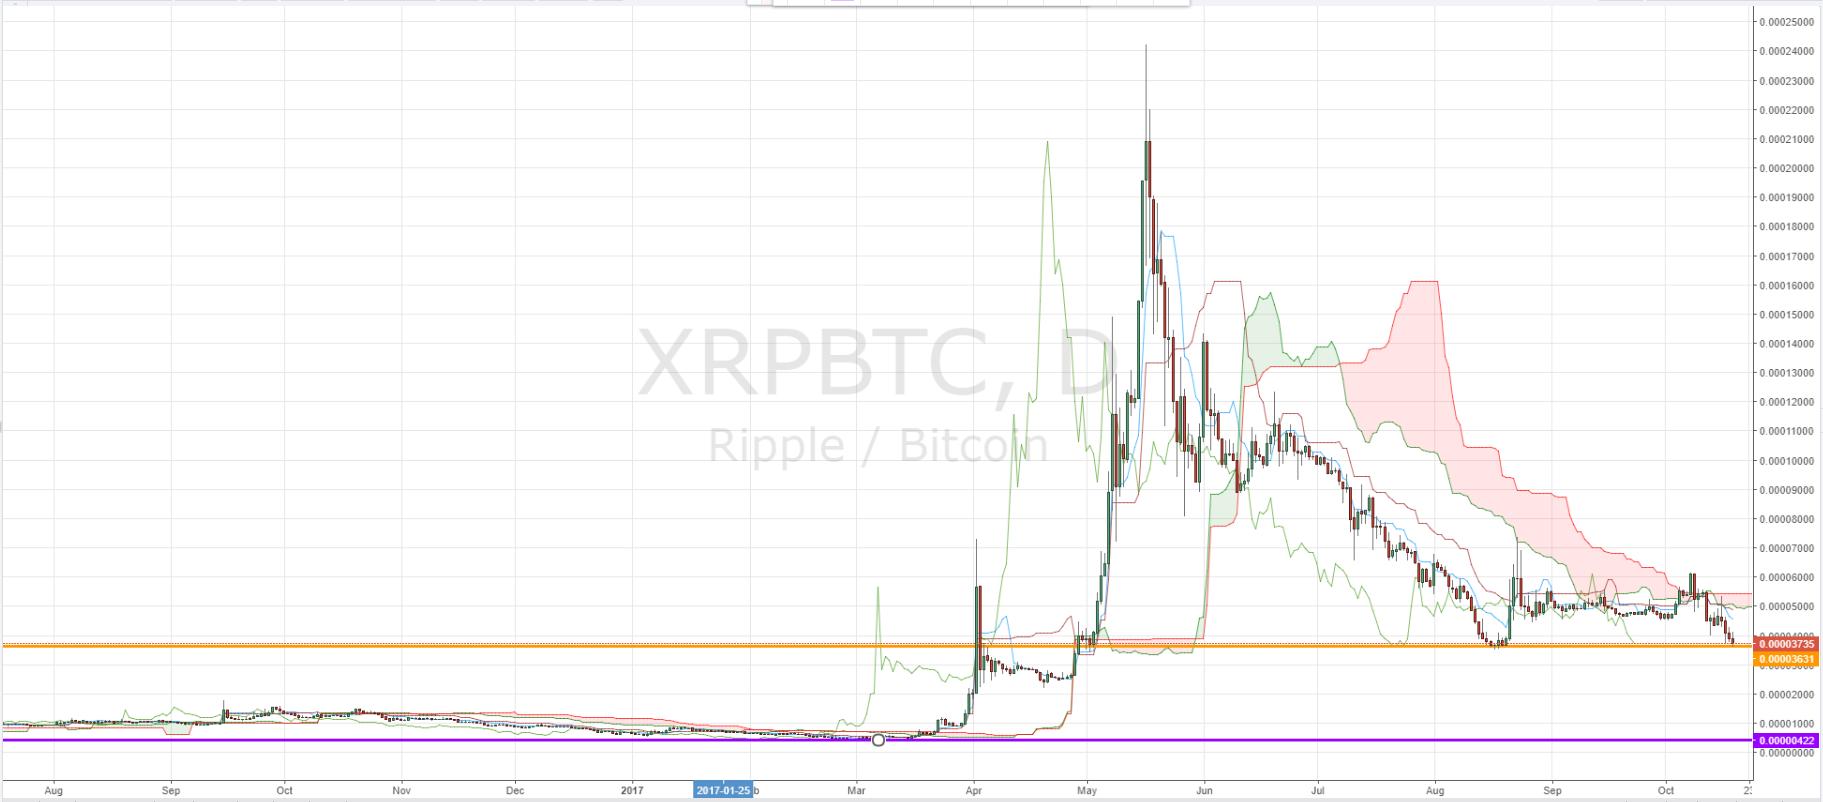 XRPBTC Daily Chart - Ripple's XRP versus Bitcoin